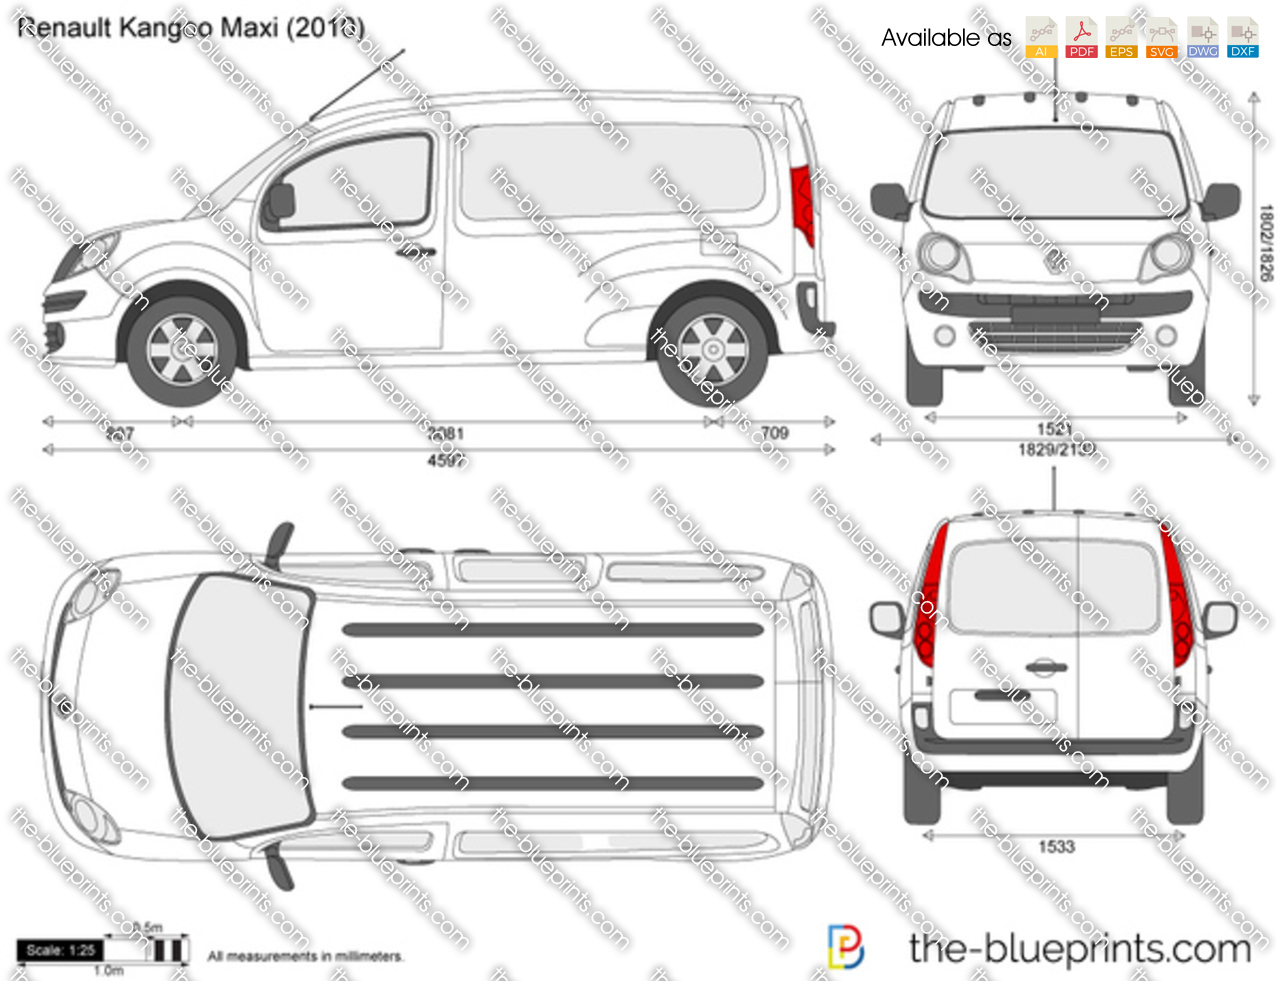 Renault Kangoo Maxi 2012